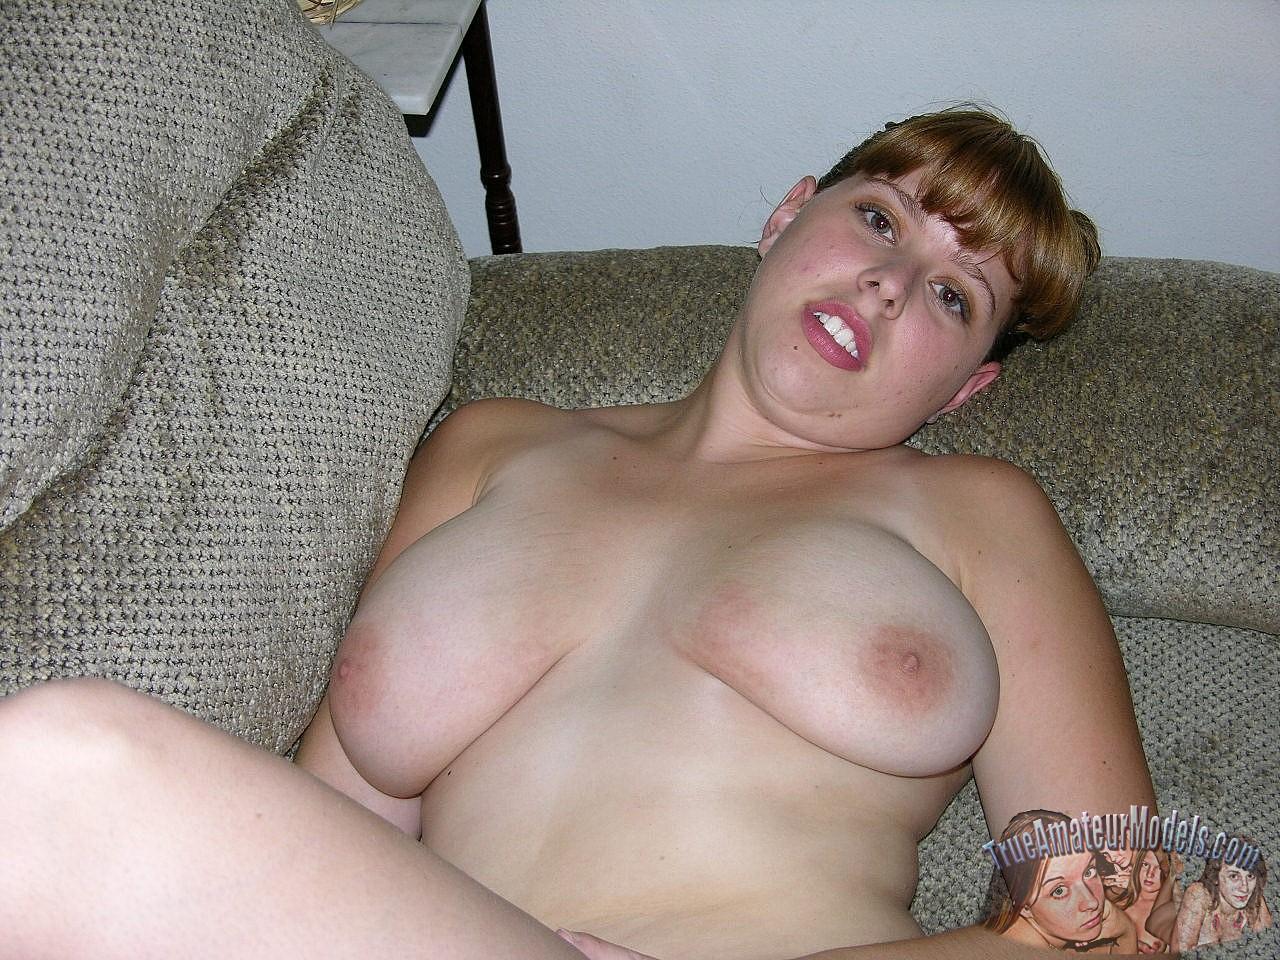 true amateur models riley nude